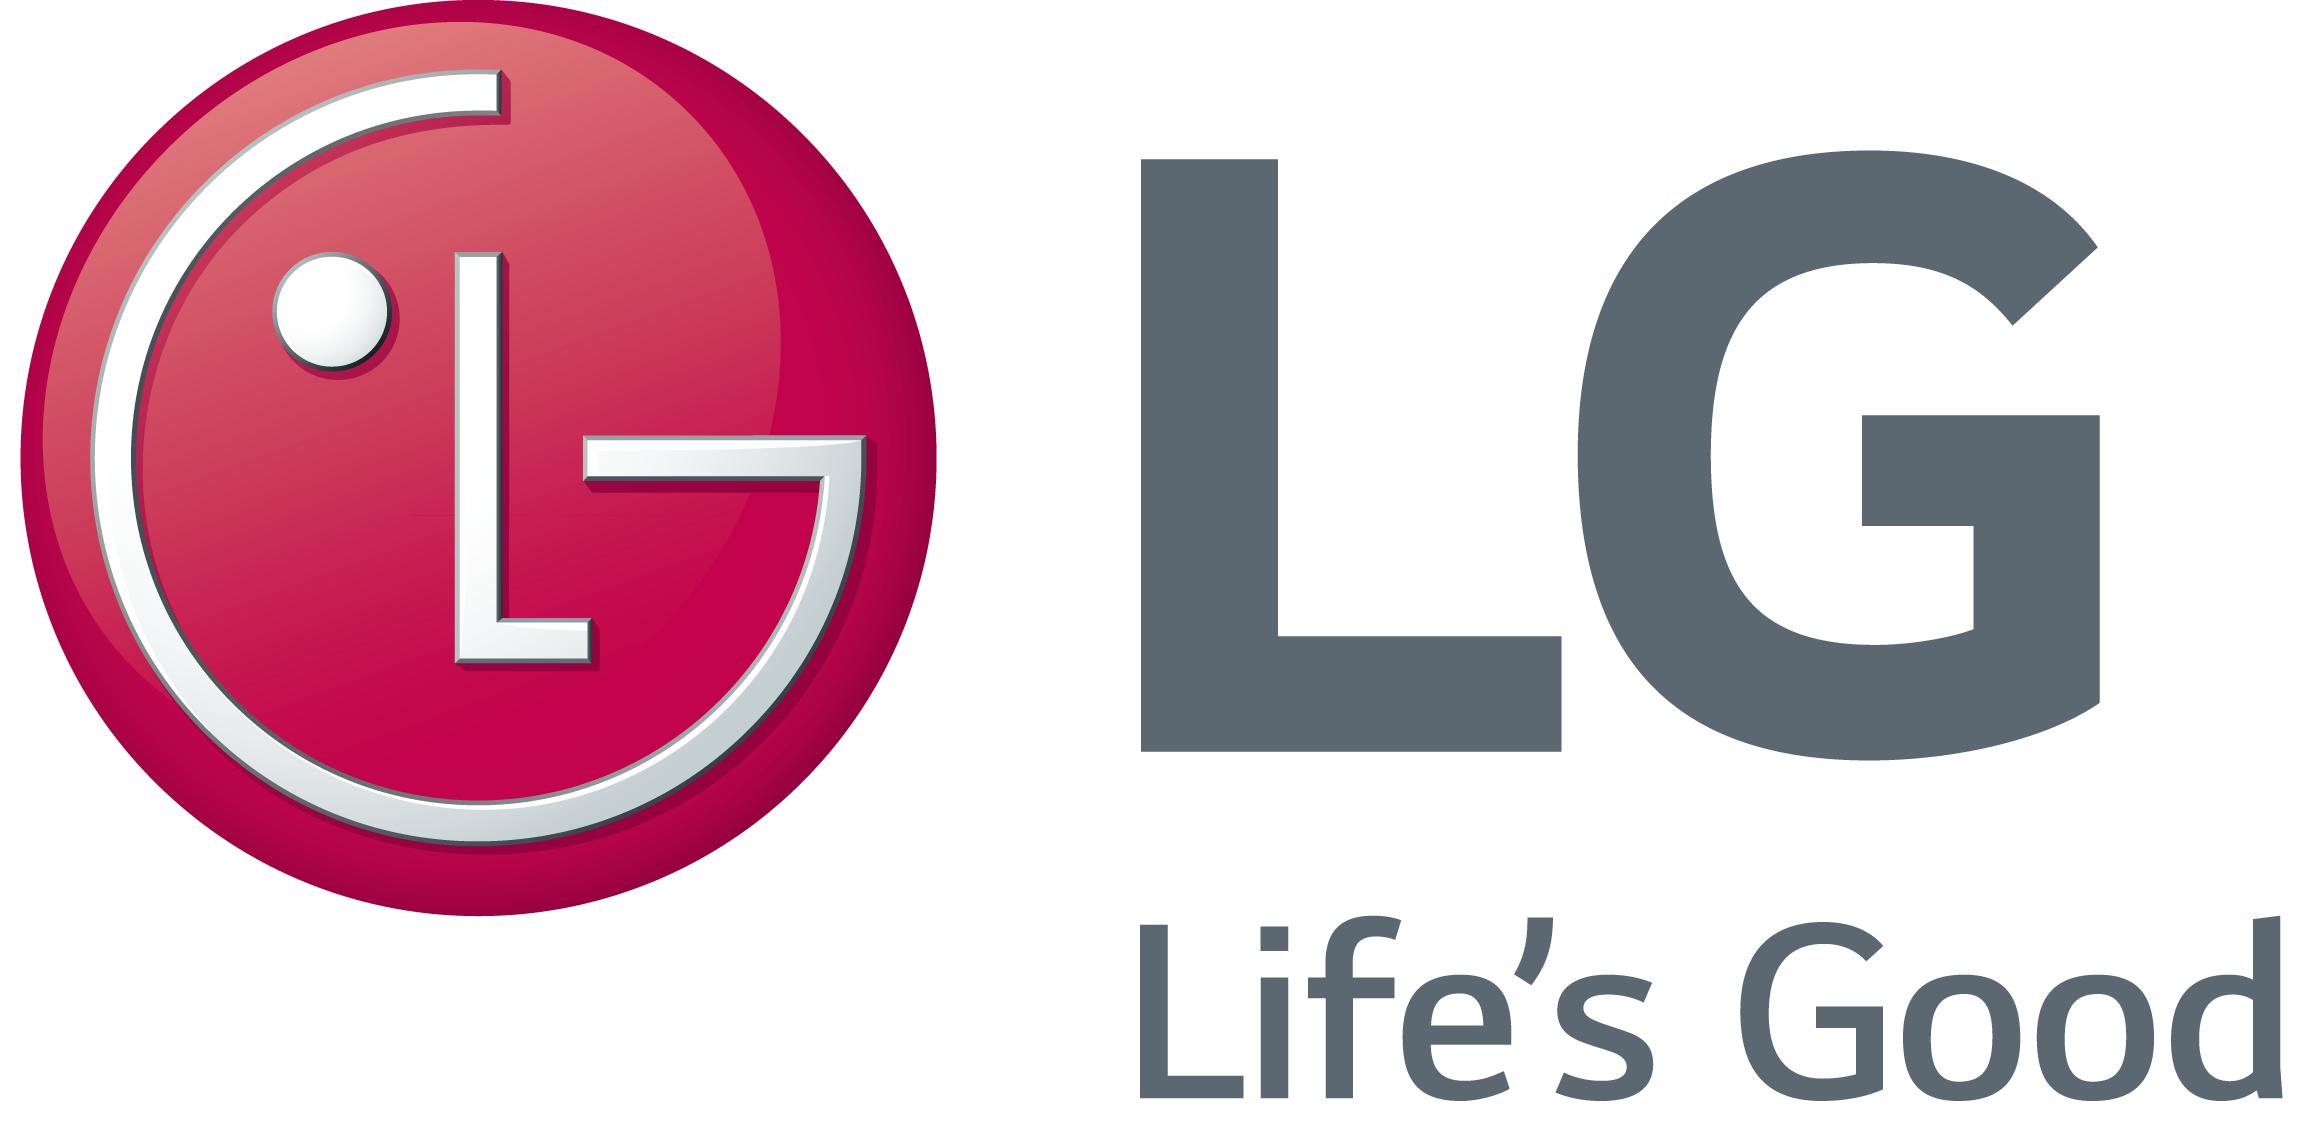 LG - Monitor 24 FHD IPS 5ms - 24CK550W